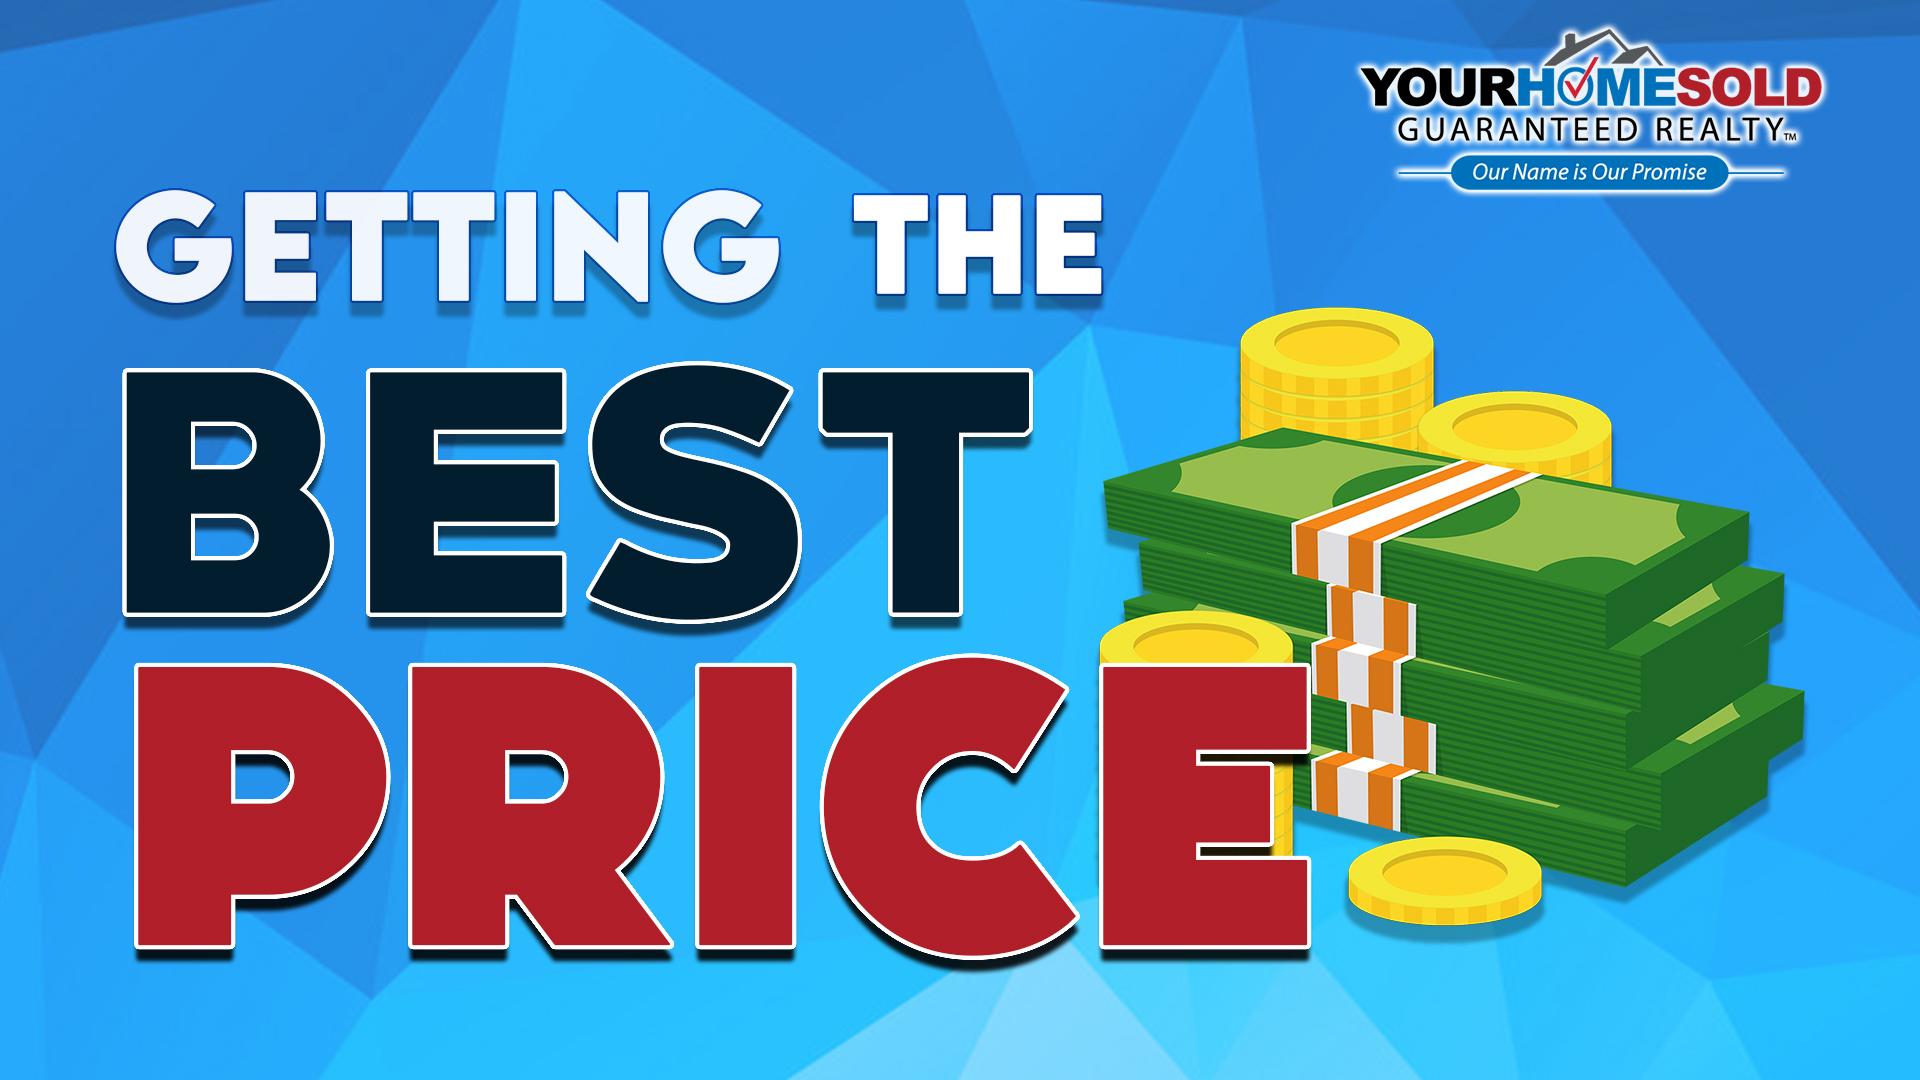 Getting the Best Price .jpg